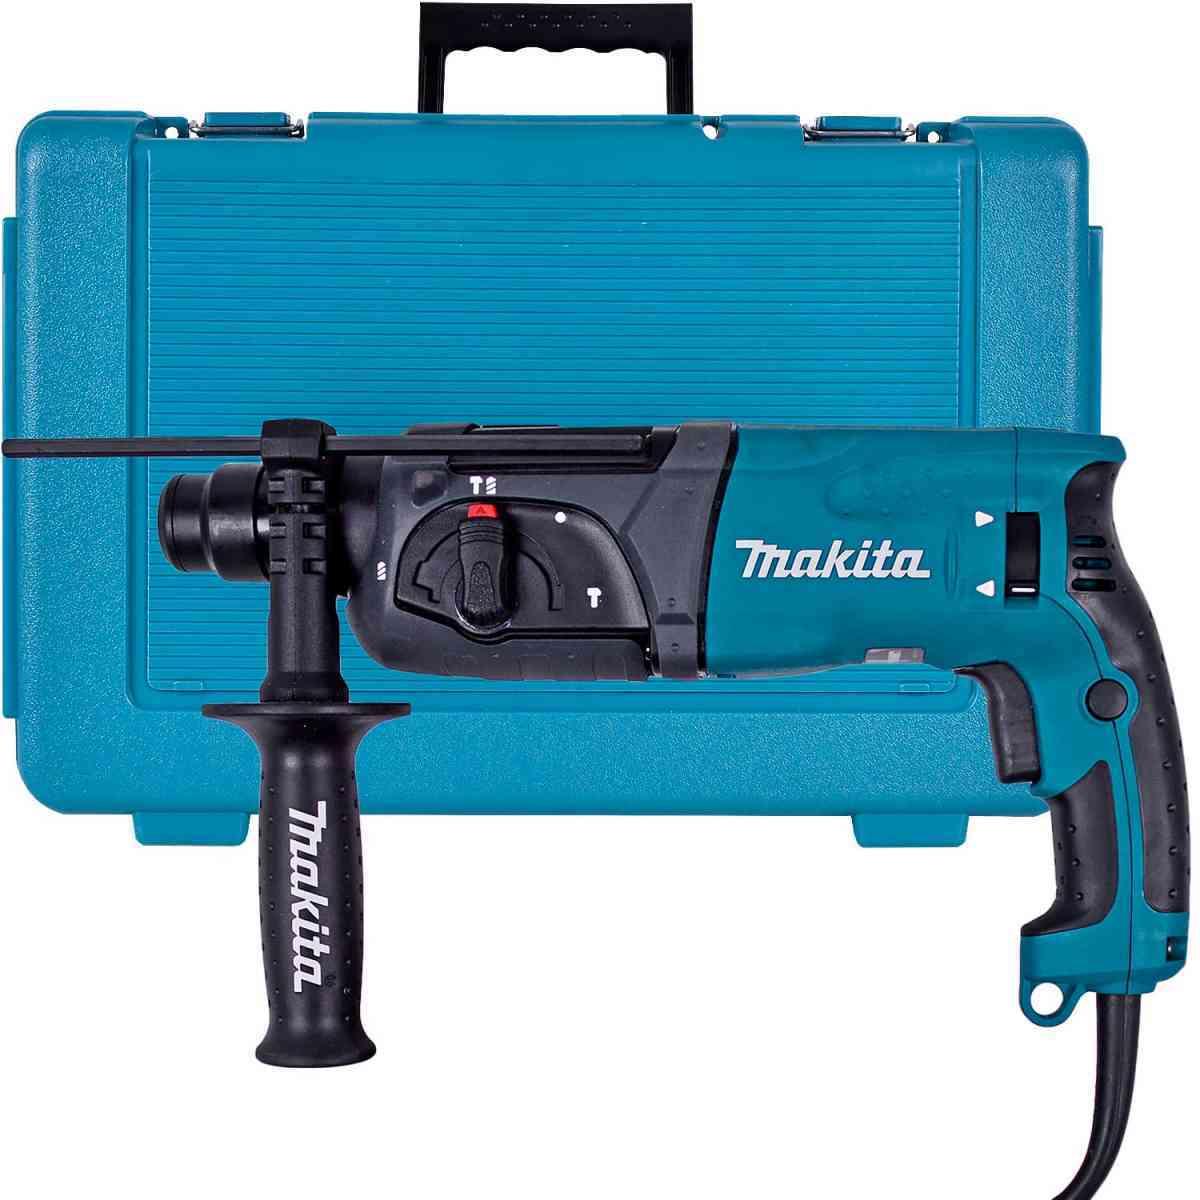 Martelete Rompedor Sds 800W Com Maleta Hr2470 Makita - 220V